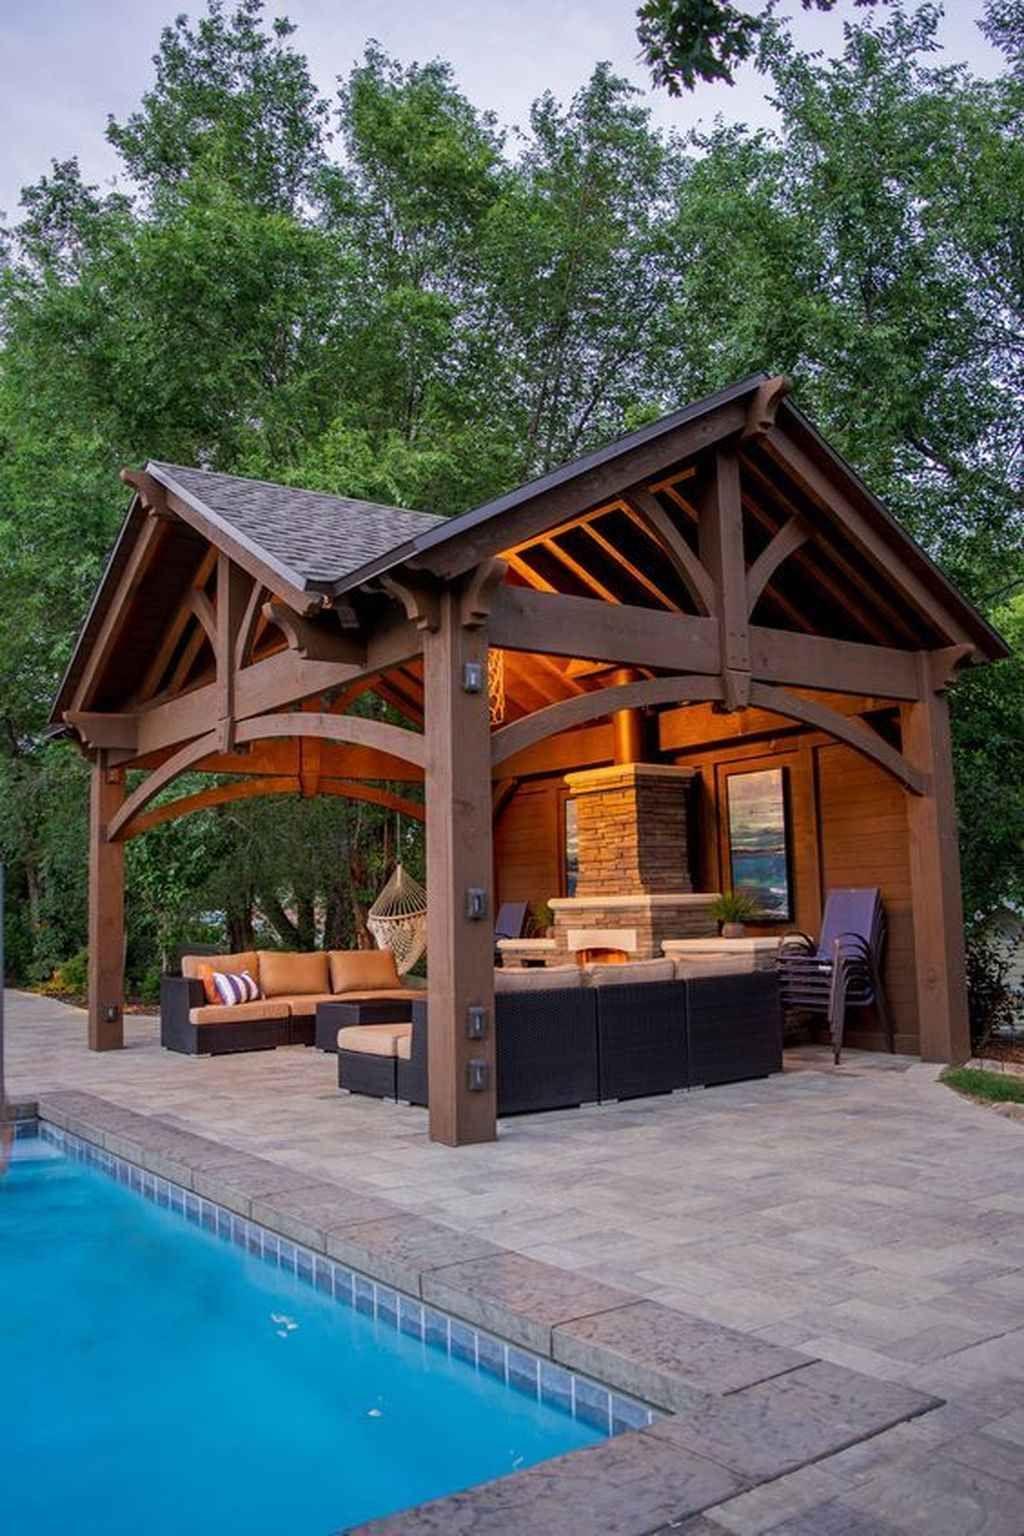 01 Incredible Outdoor Kitchen Design Ideas For Summer Backyard Patio Designs Outdoor Kitchen Design Backyard Pavilion